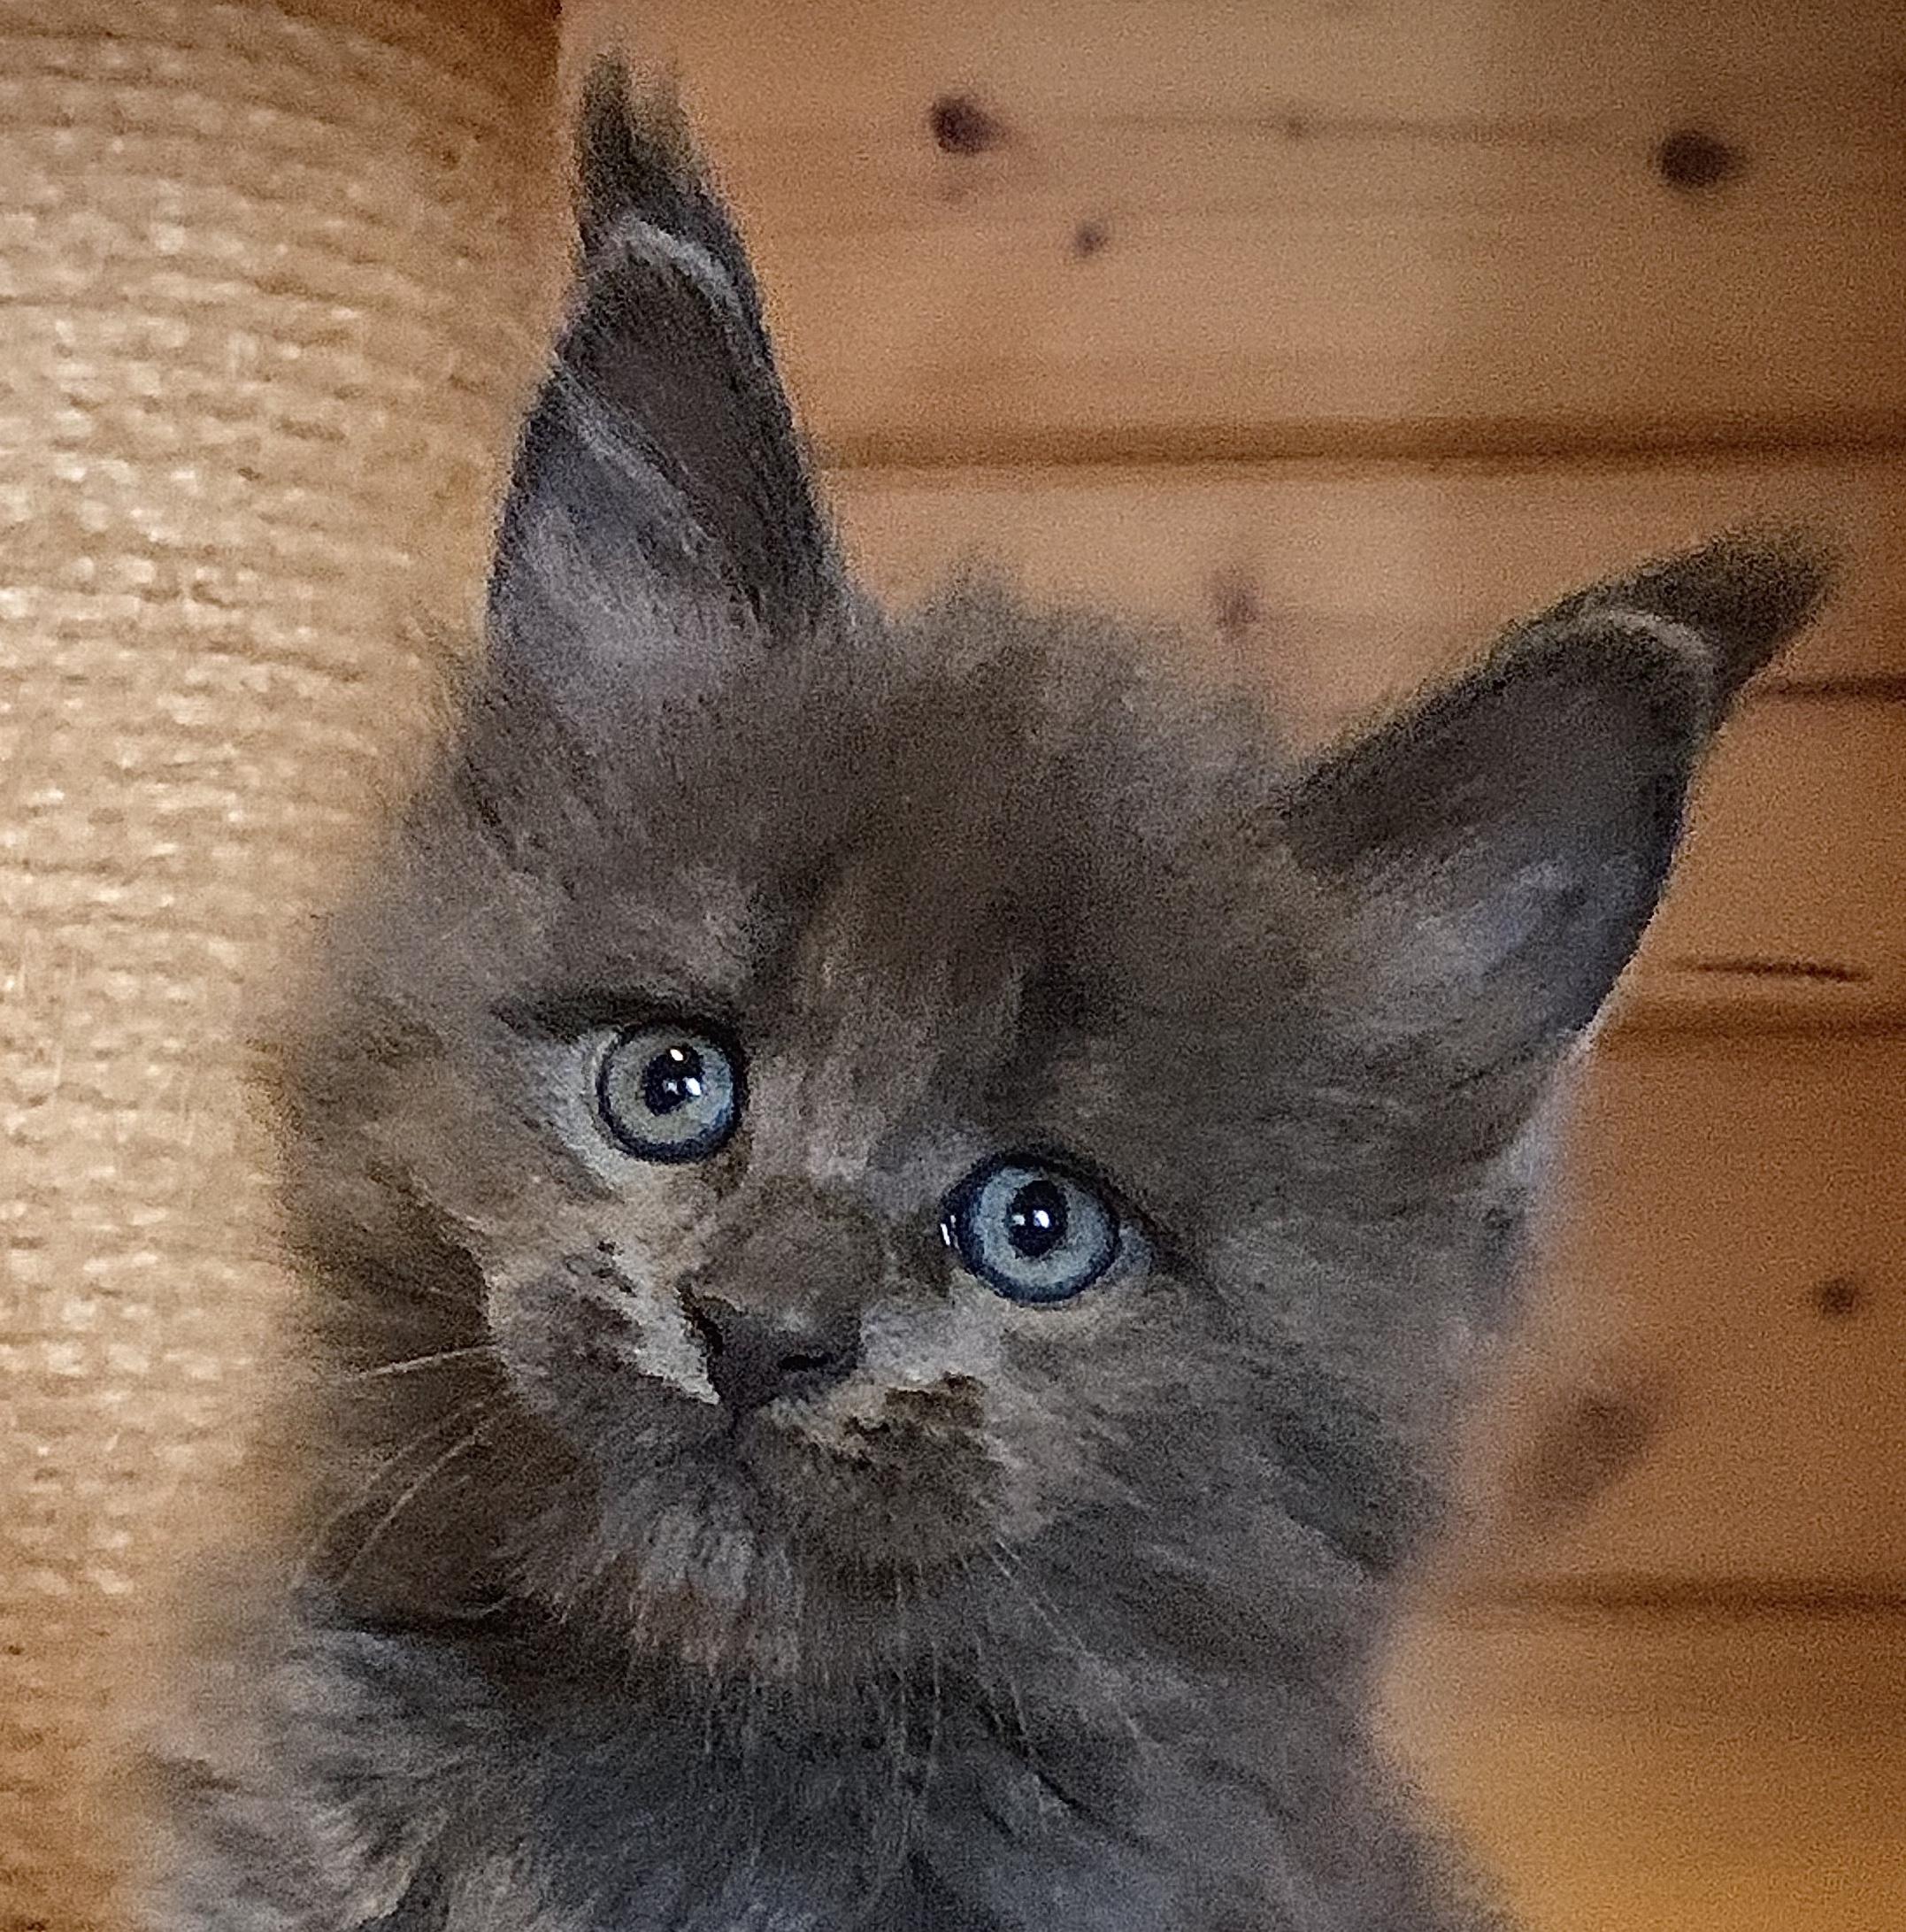 fotka kočky VRH L: LORD GRAND VON ERILLIAN*CZ